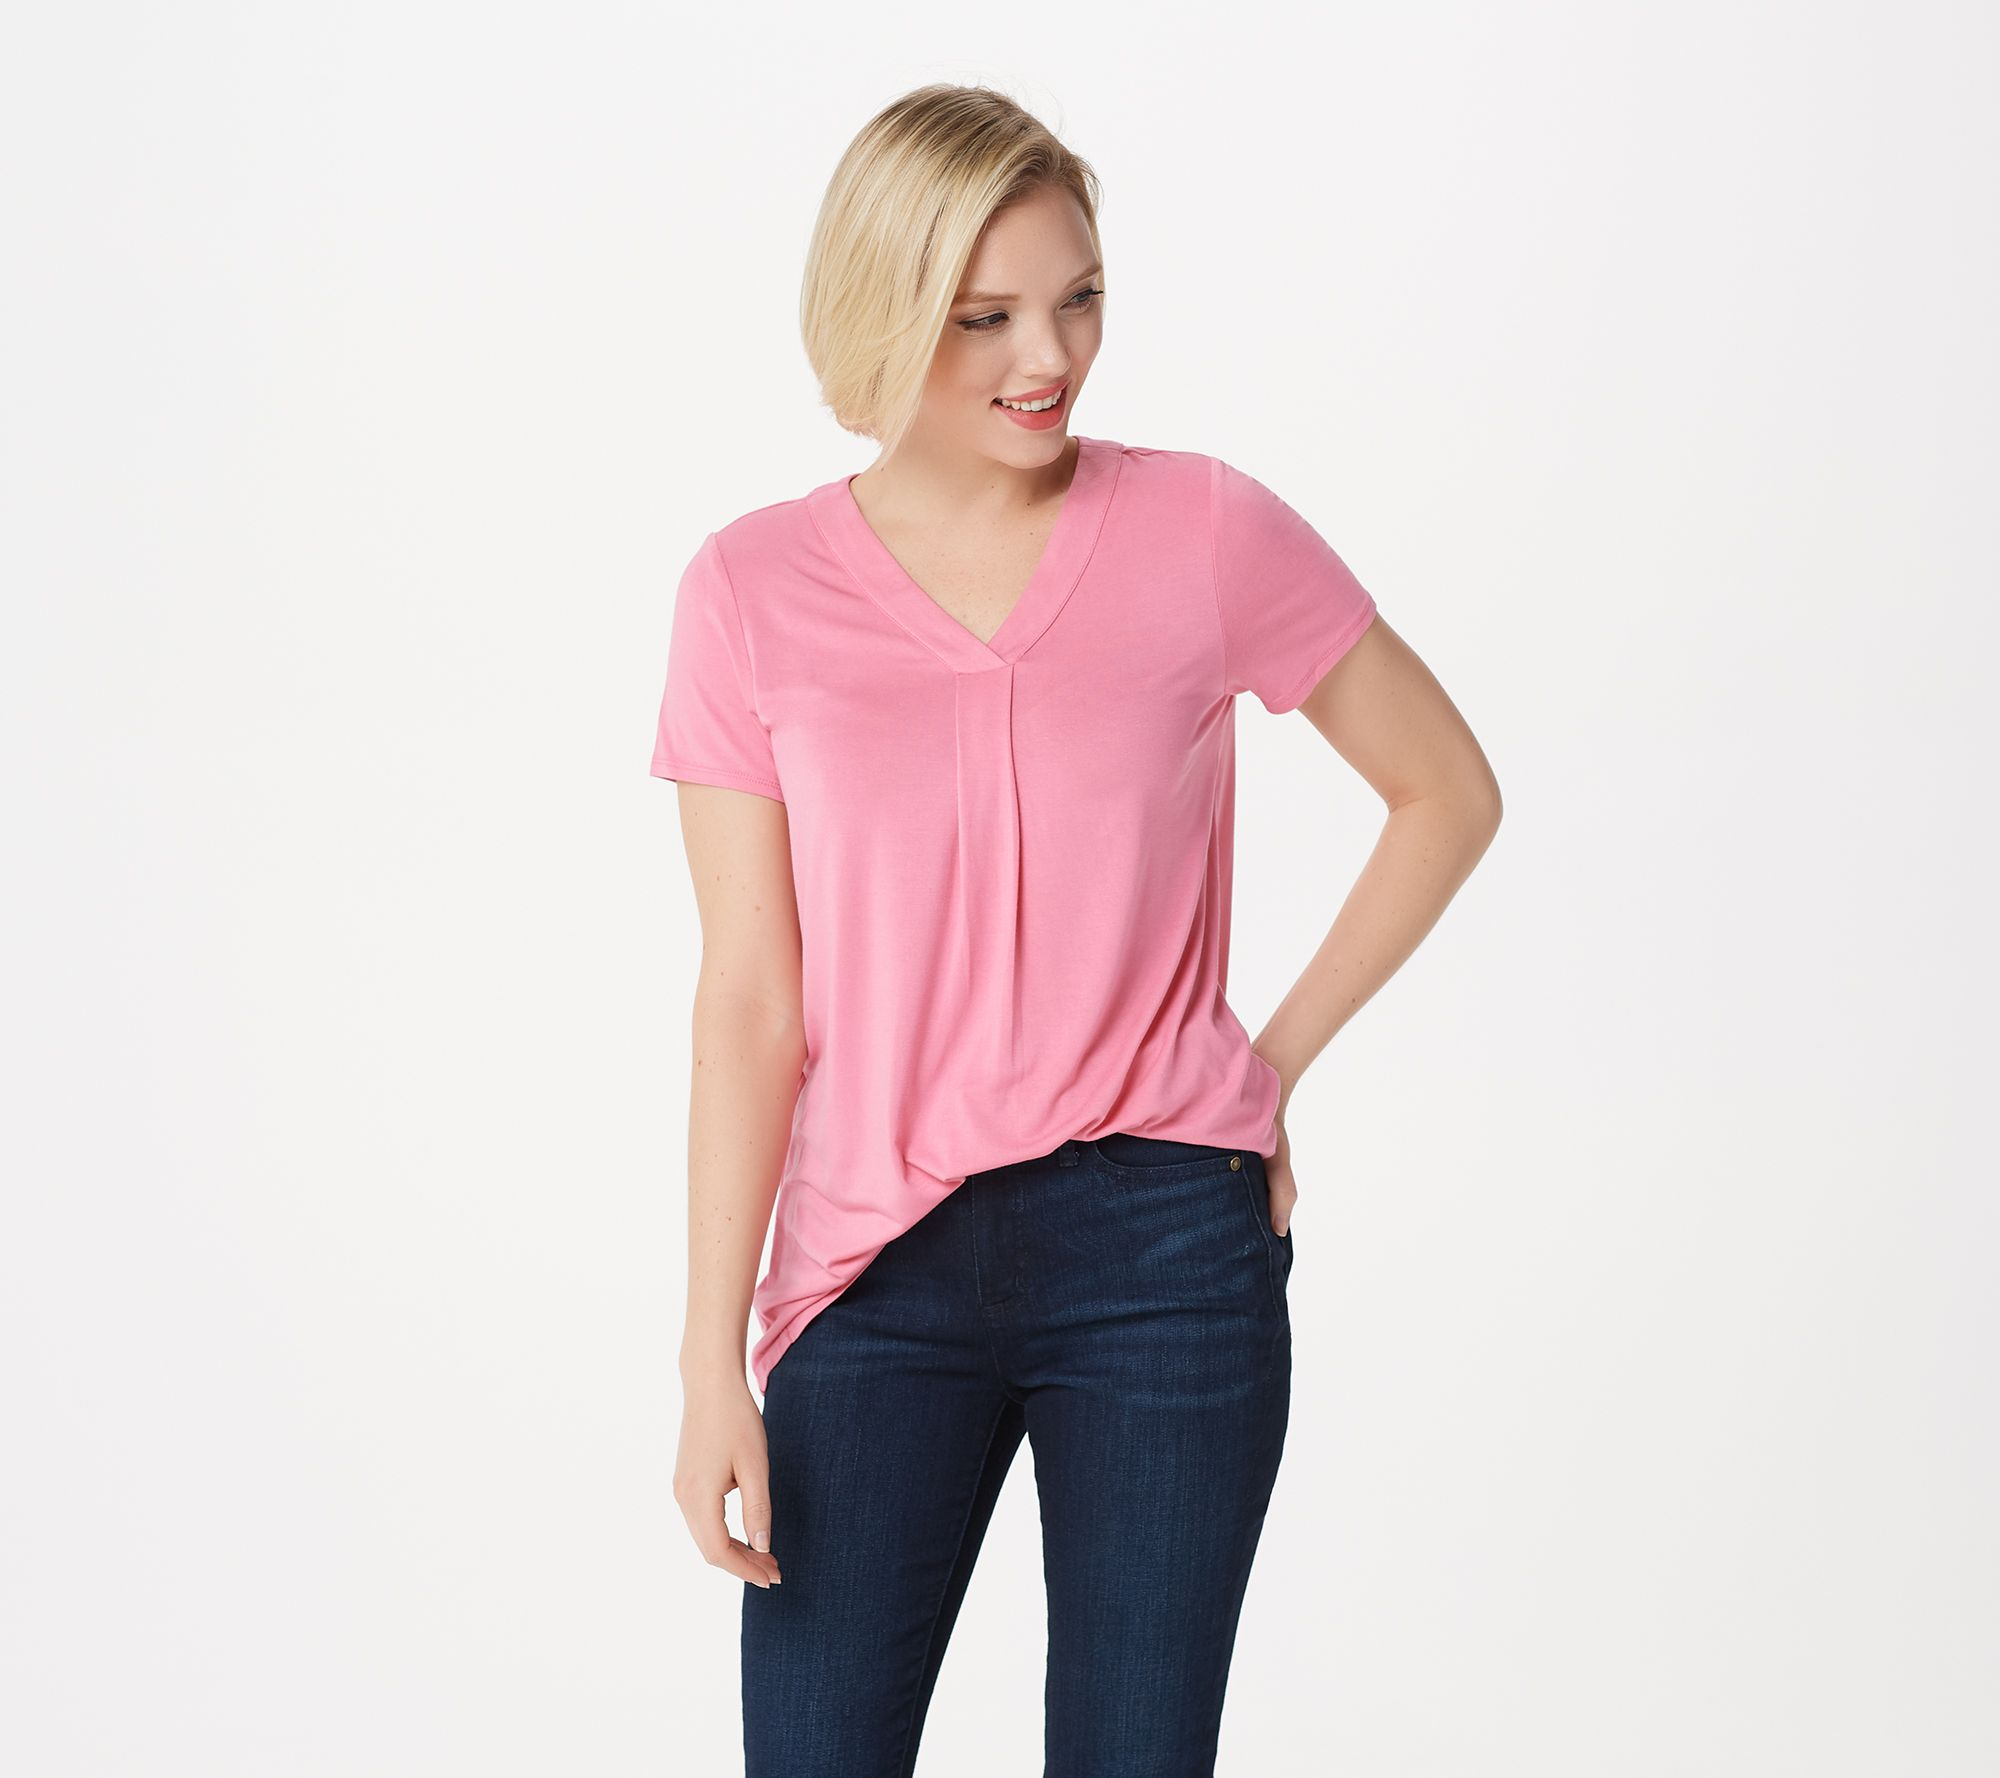 ff4d6f91c282 Laurie Felt Short Sleeve V-Neck T-Shirt - Page 1 — QVC.com